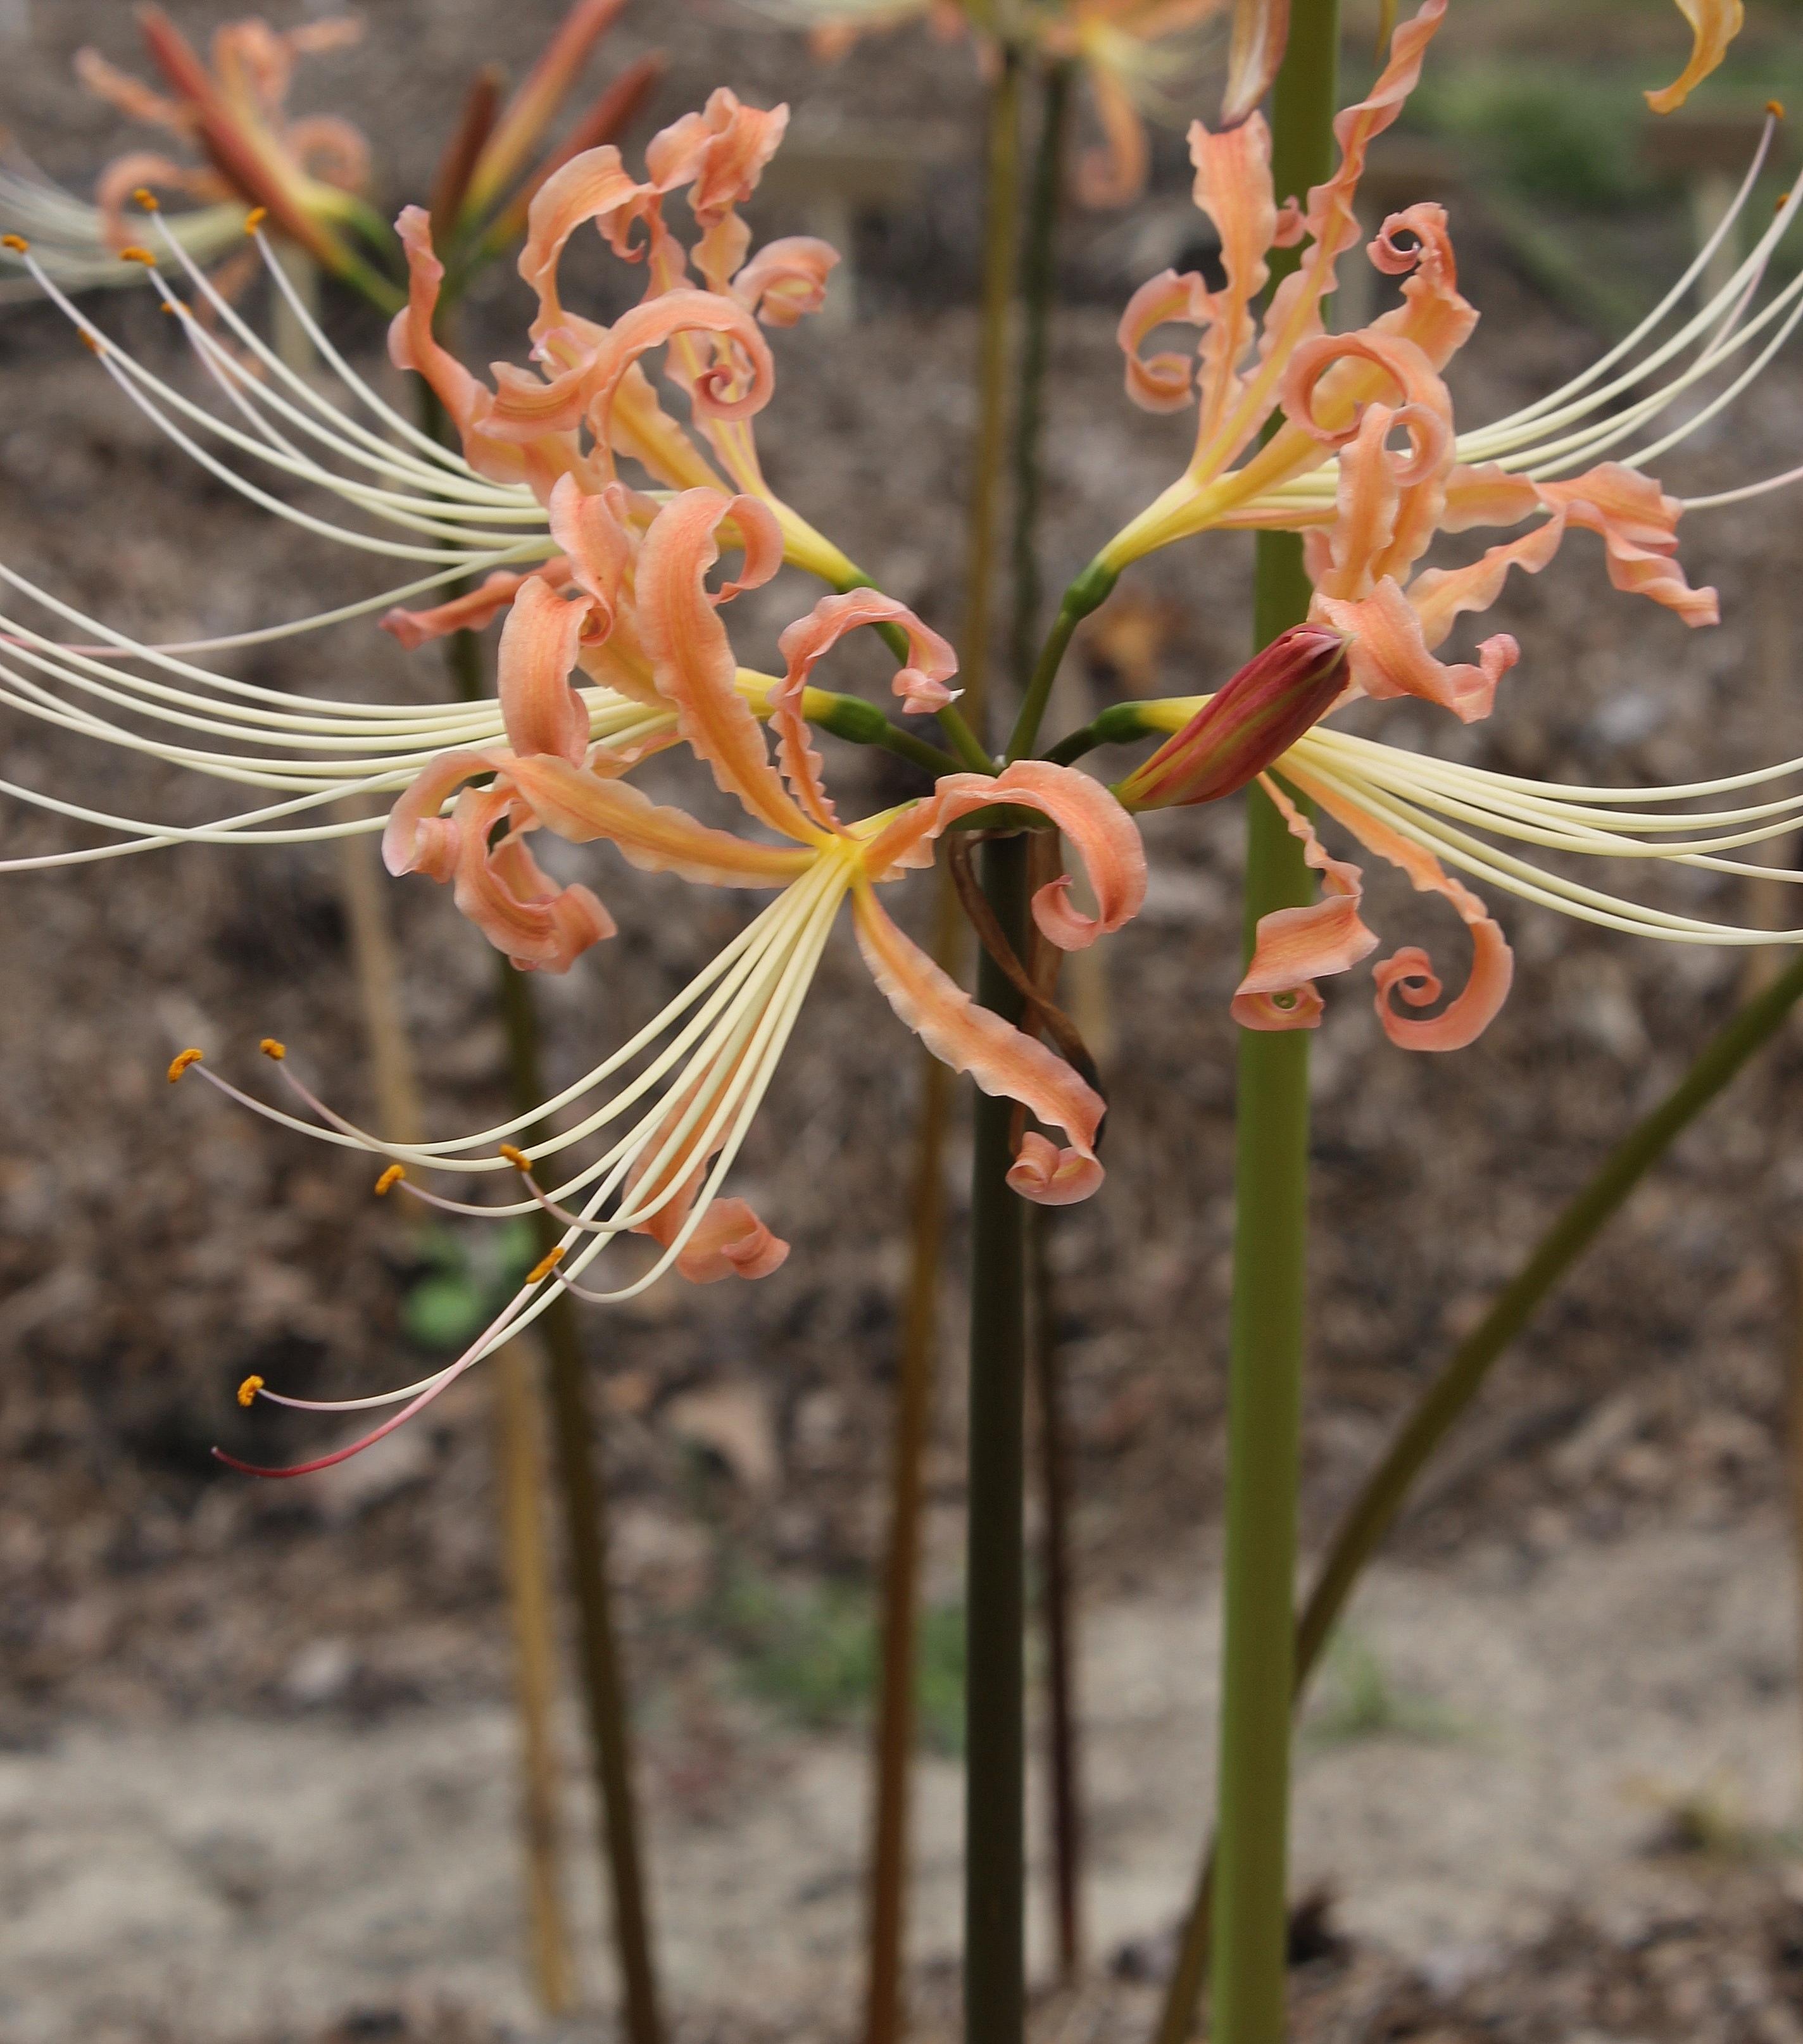 Lycoris x straminea 'Peaches and Cream' @ JLBG - a Phil Adams hybrid of Lycoris radiata var. pumila x chinensis, named by JLBG/PDN